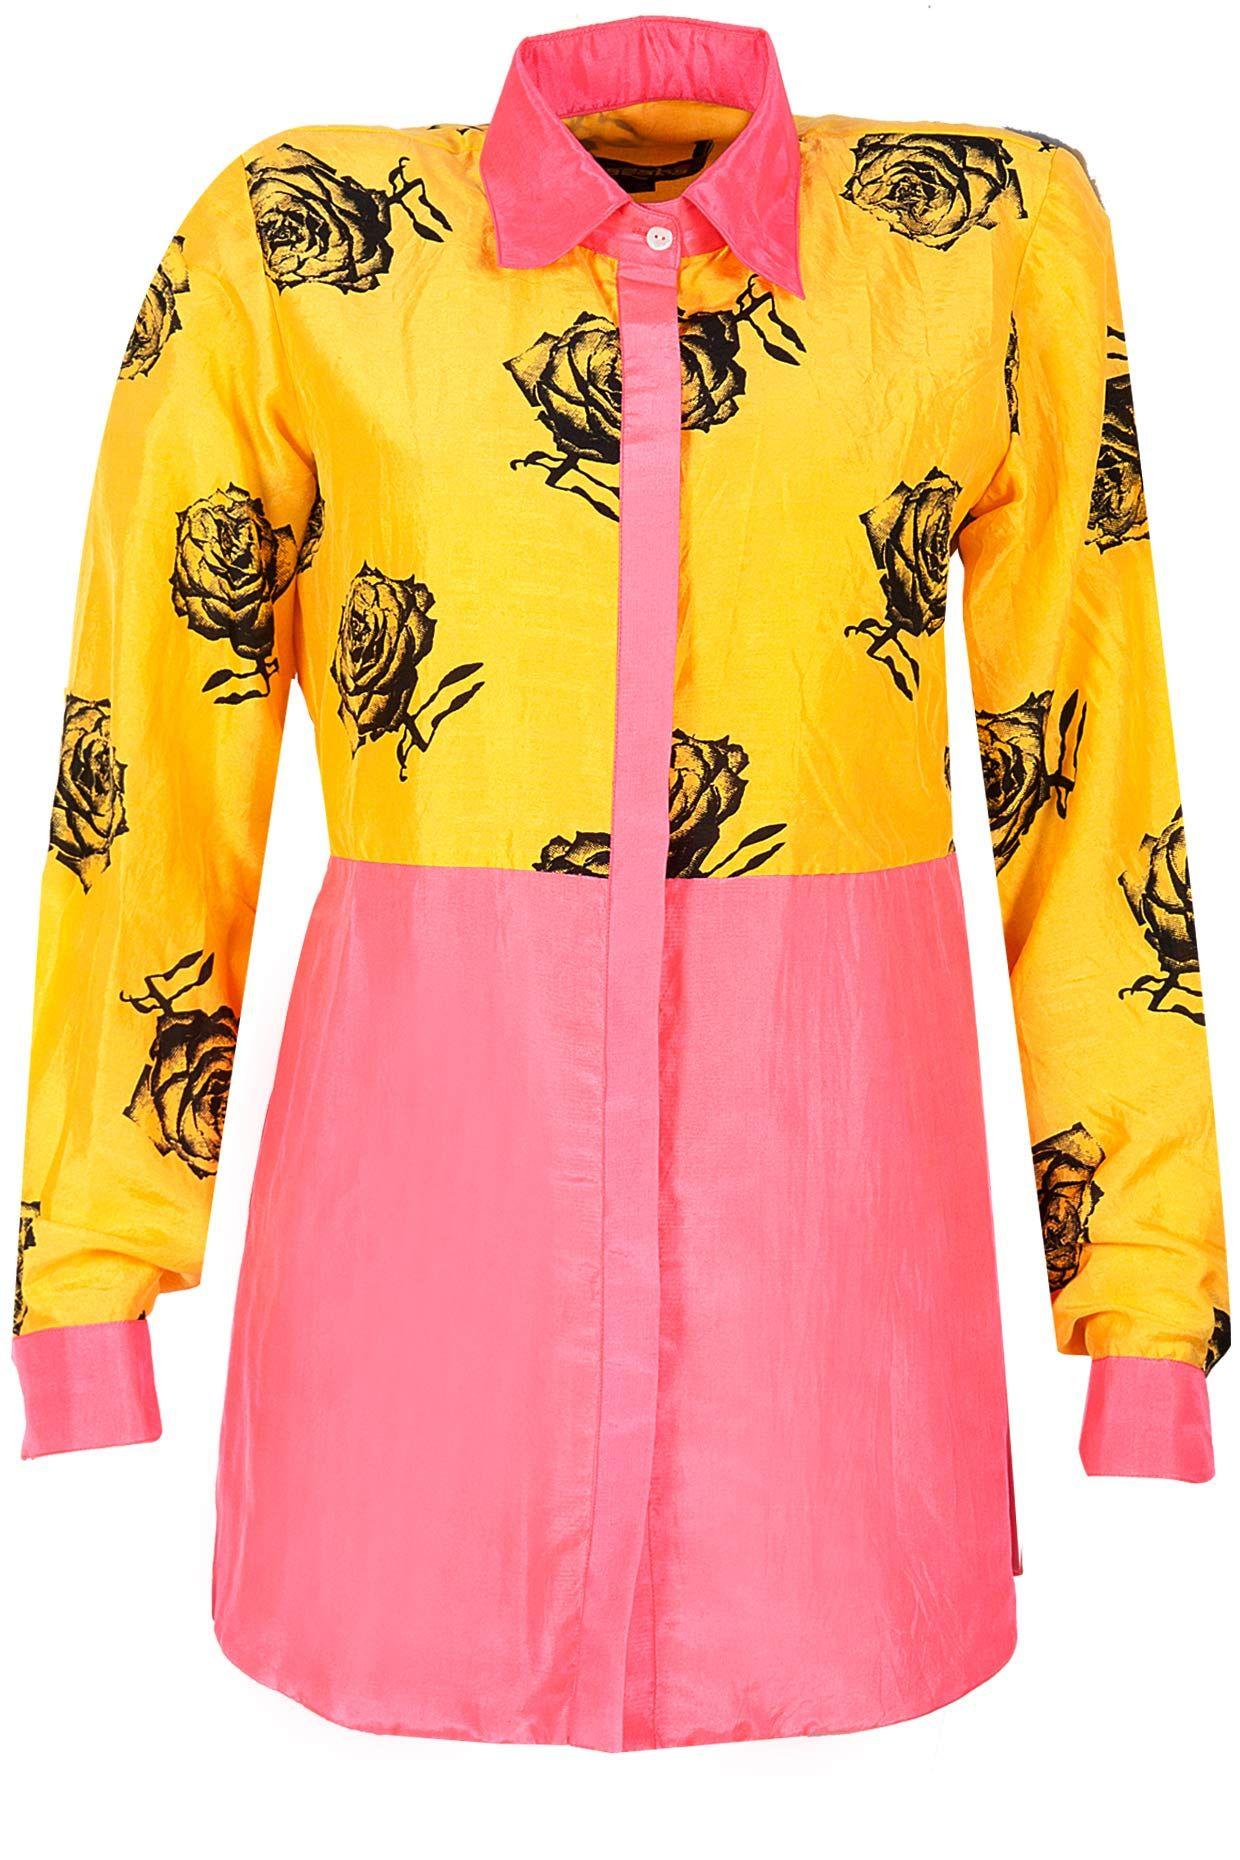 Half and half yellow rose and pink silk shirt BY MASABA Shop now at perniaspopupshop.com #perniaspopupshop #clothes #womensfashion #love #indiandesigner  #MASABA #happyshopping #sexy #chic #fabulous #PerniasPopUpShop #quirky #fun